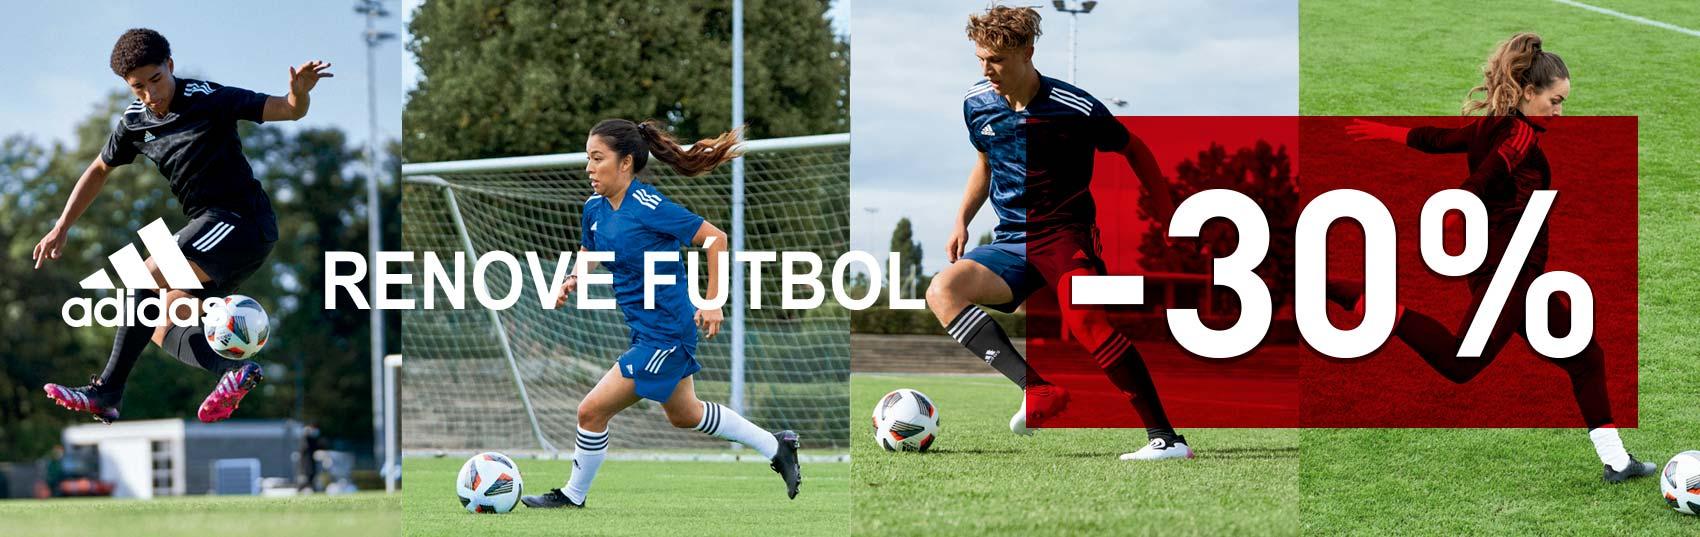 Botas de fútbol ADIDAS -30%